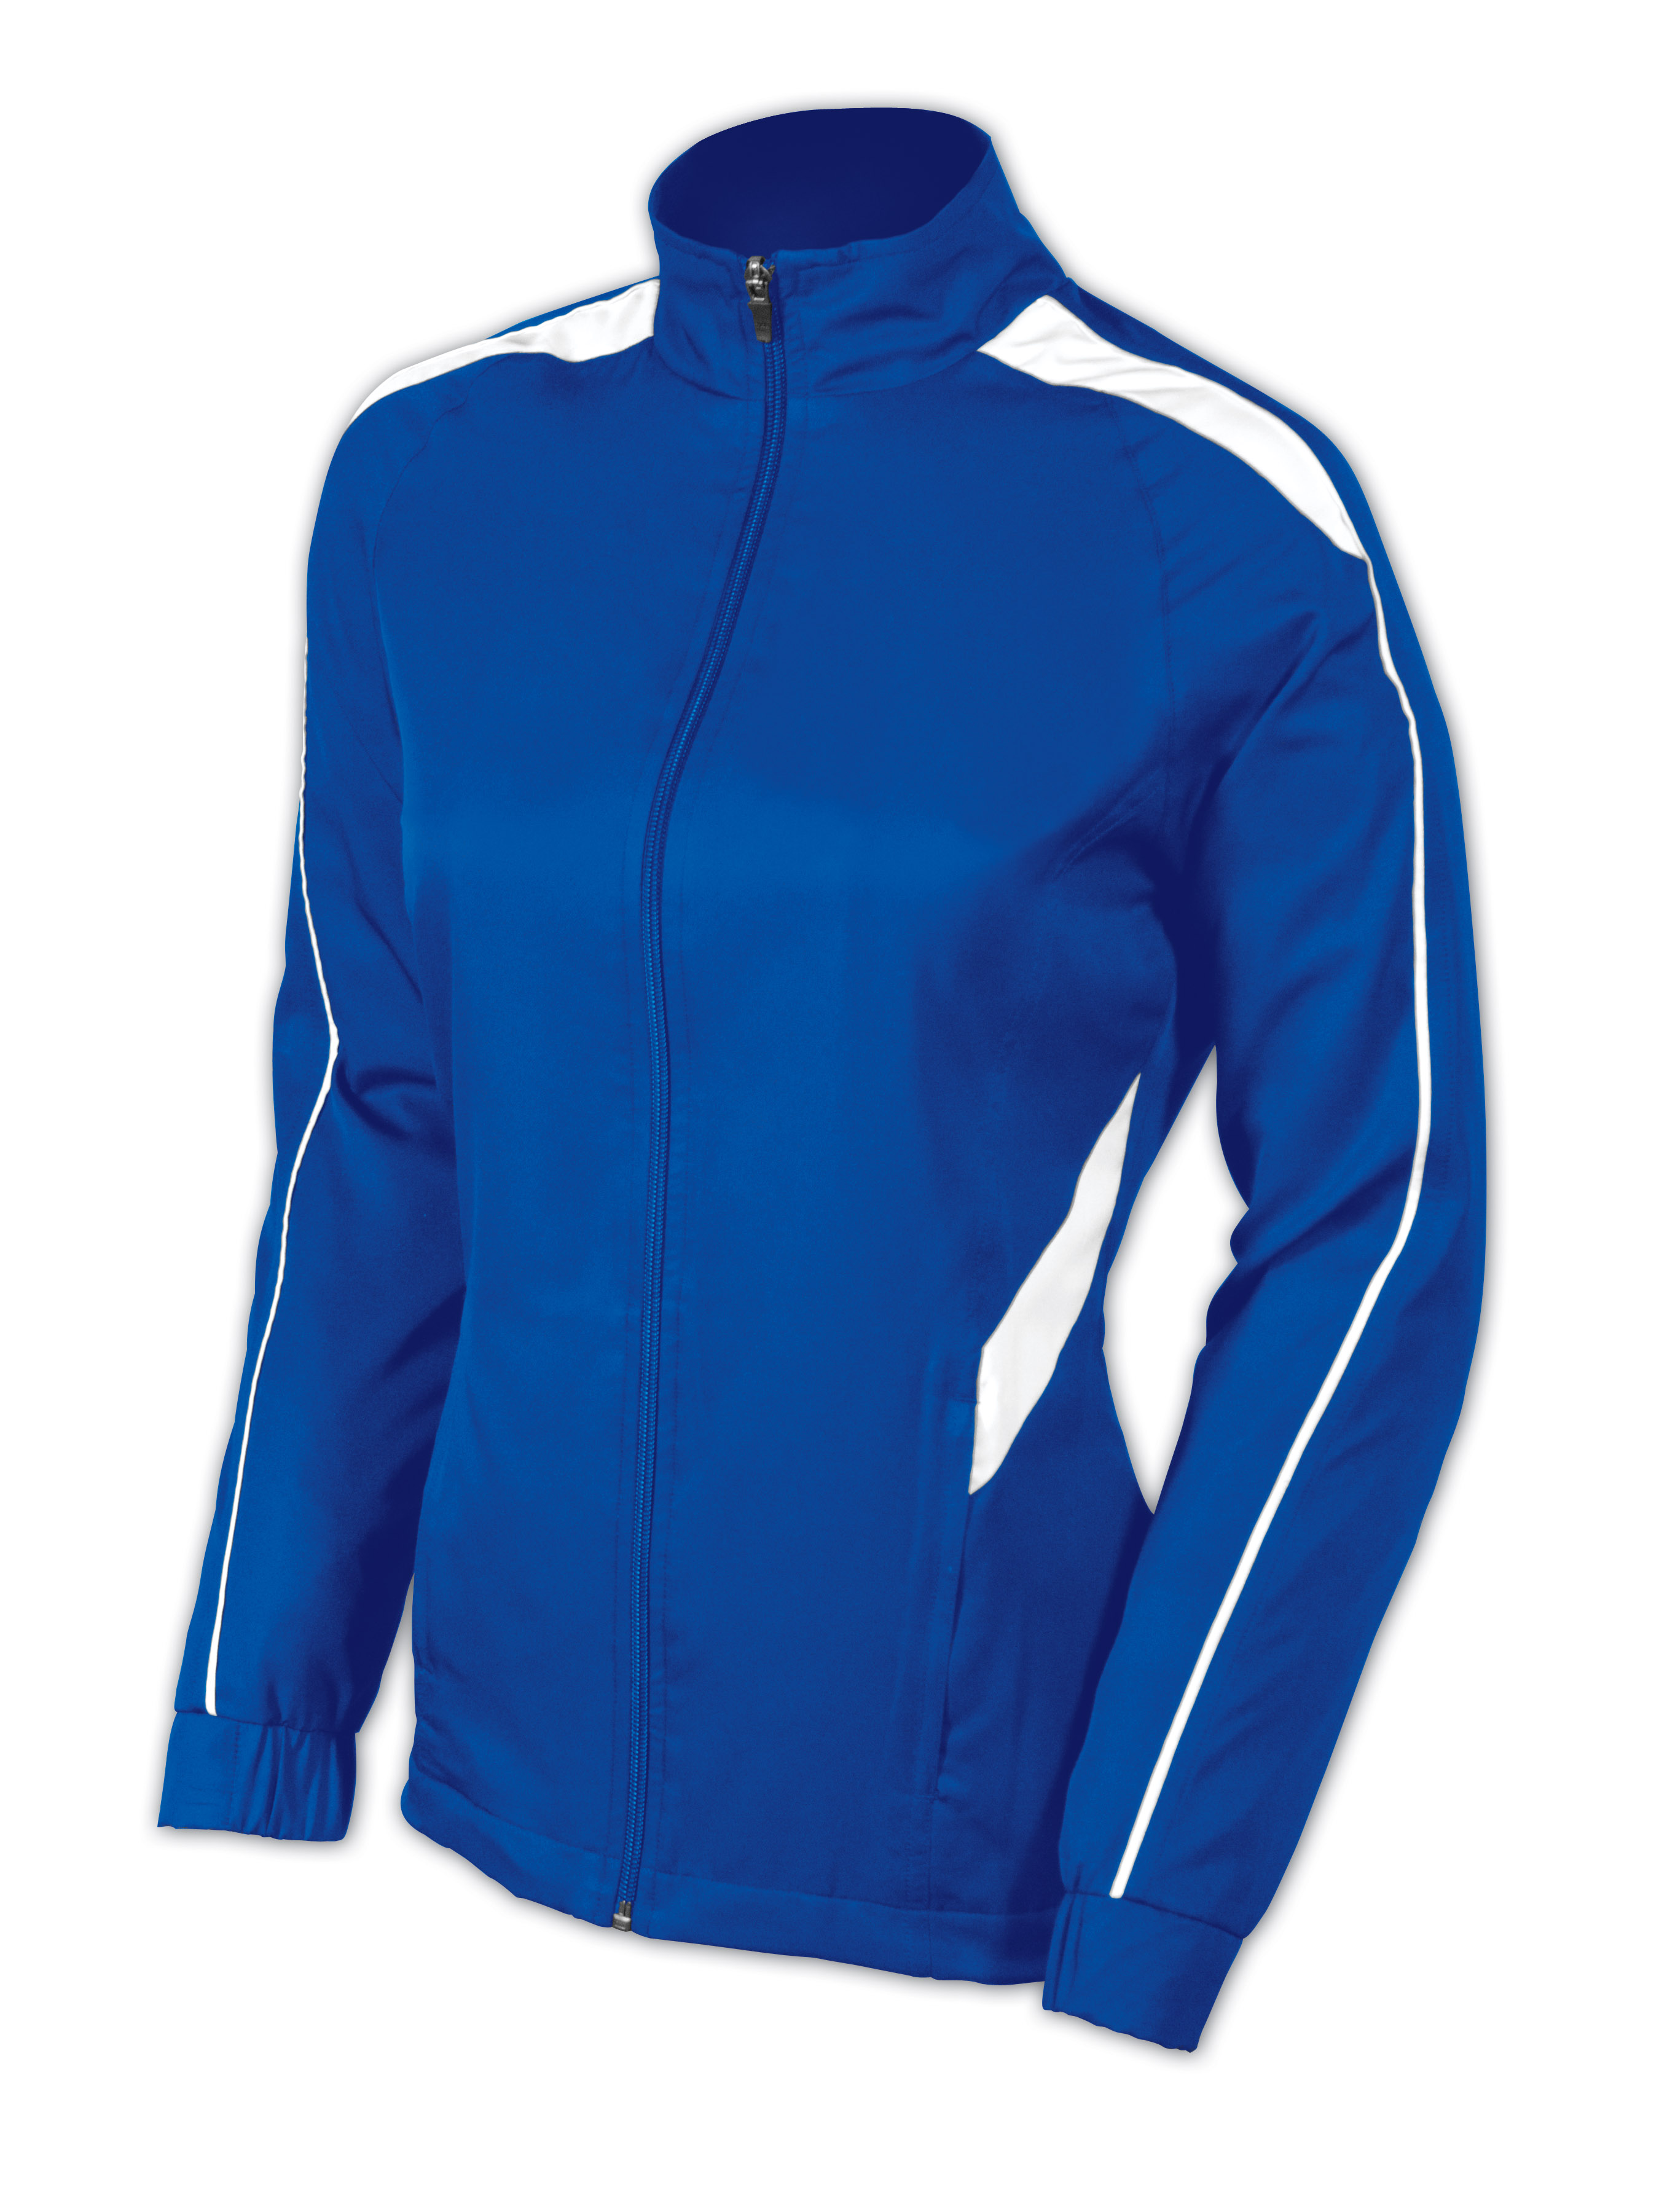 Style 1145 Jacket (Ladies)